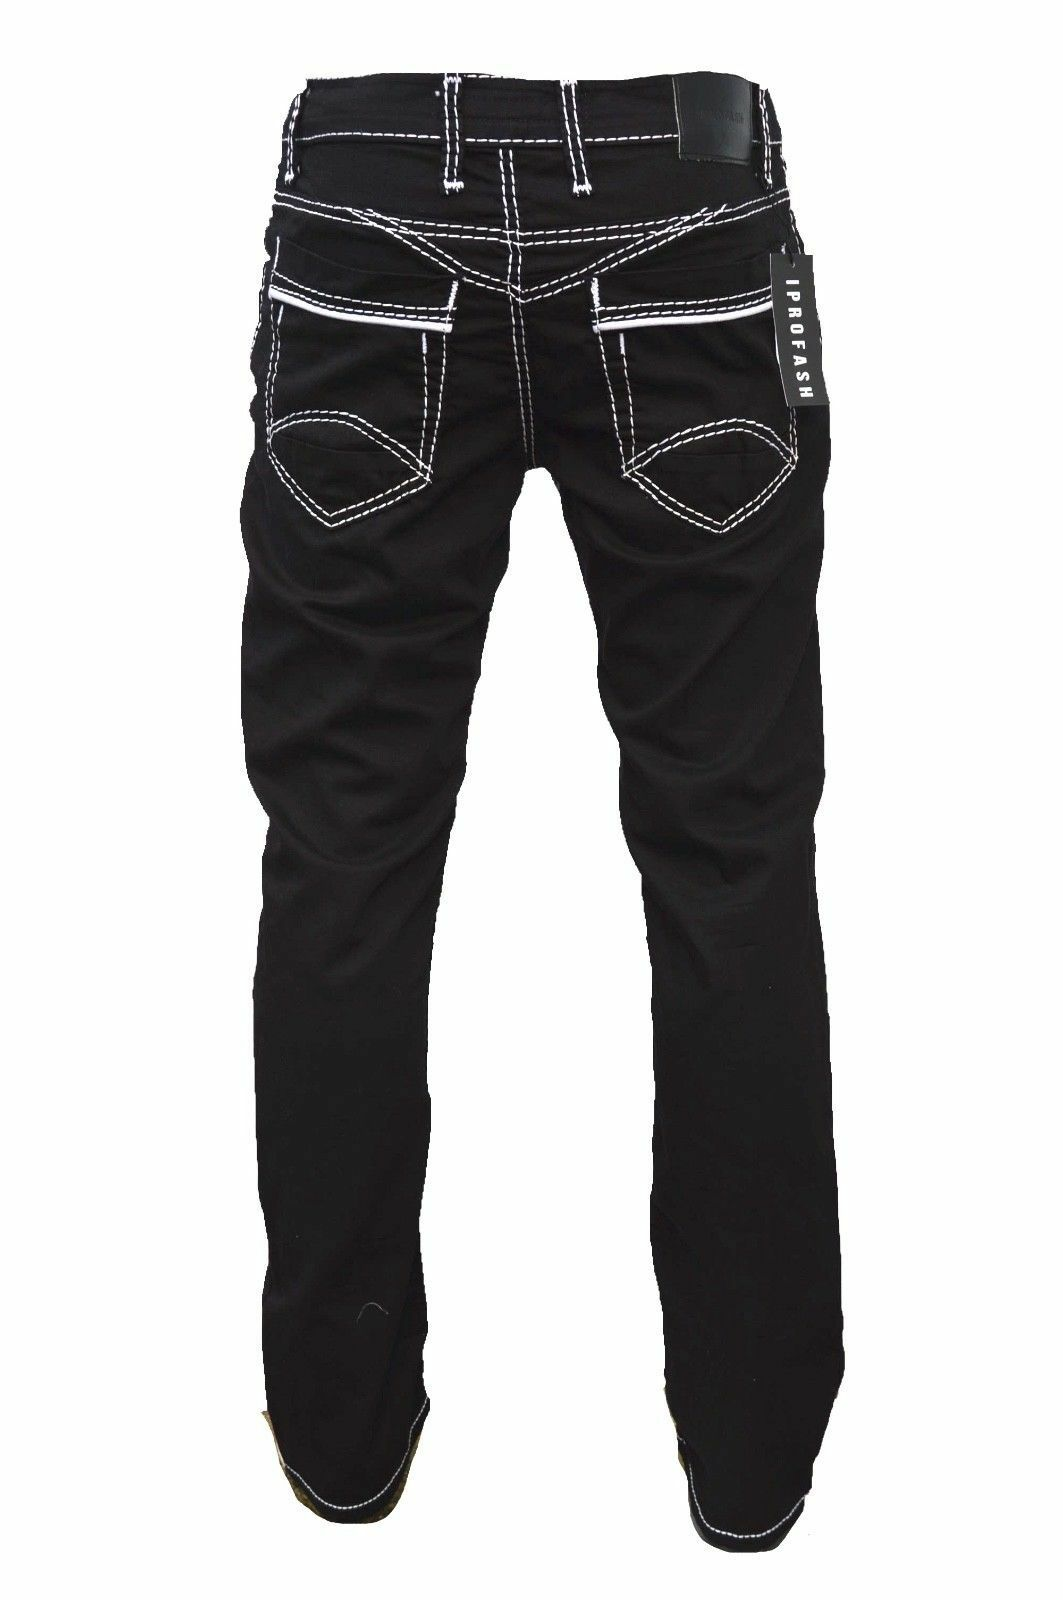 Herren-Jeans-Hose-Denim-KC-Black-Washed-Straight-Cut-Regular-Dicke-Naht-naehte Indexbild 10